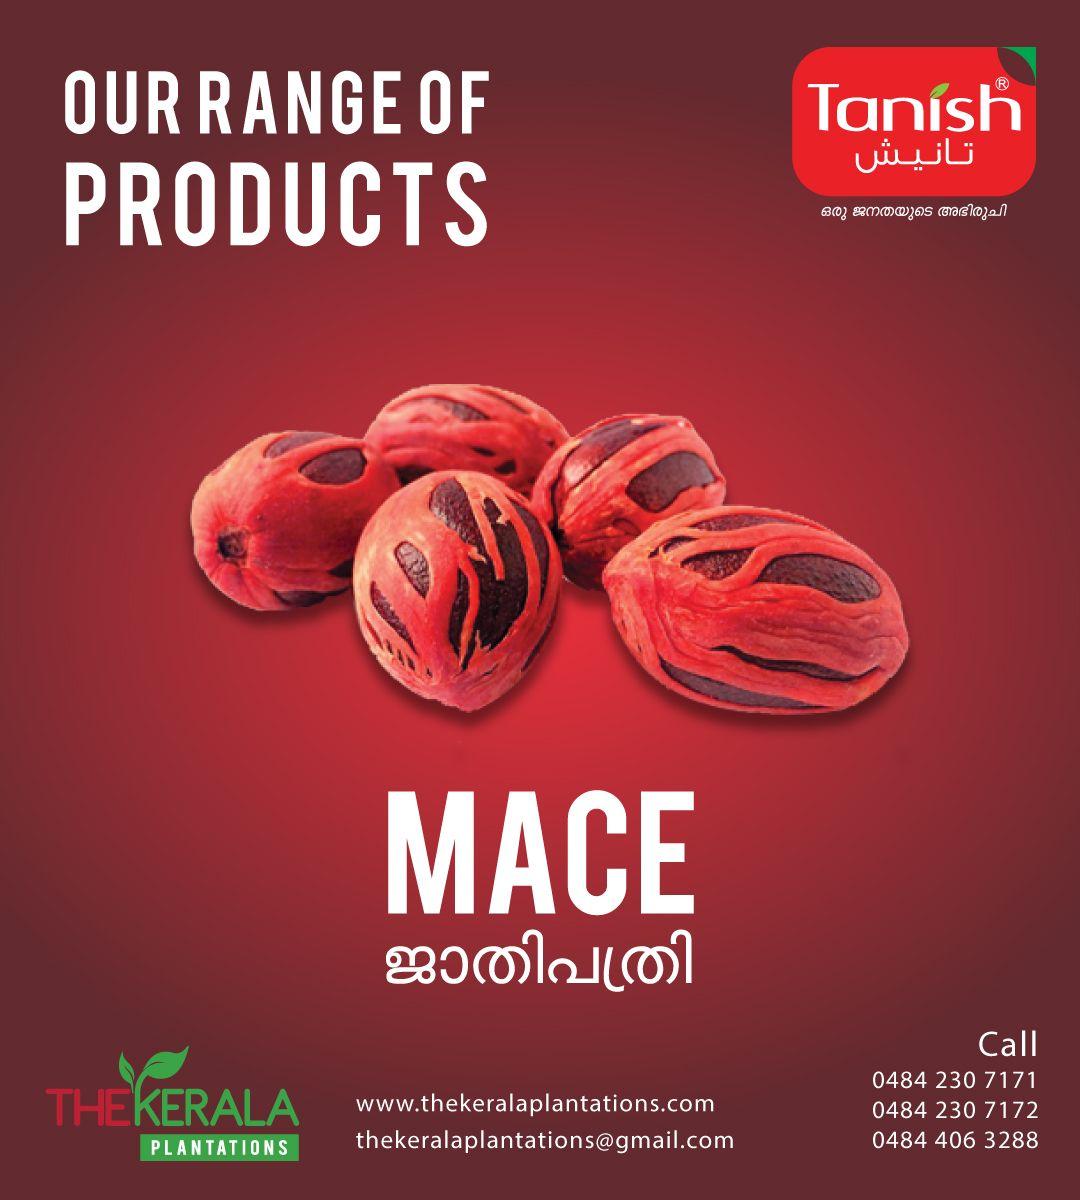 Tanish Introduce Natural Mace Call Us At 0484 2307171 0484 2307172 0484 4063288 For More Details Mail Us At Thekeralaplantations Gmail Com Or Mace Gmail